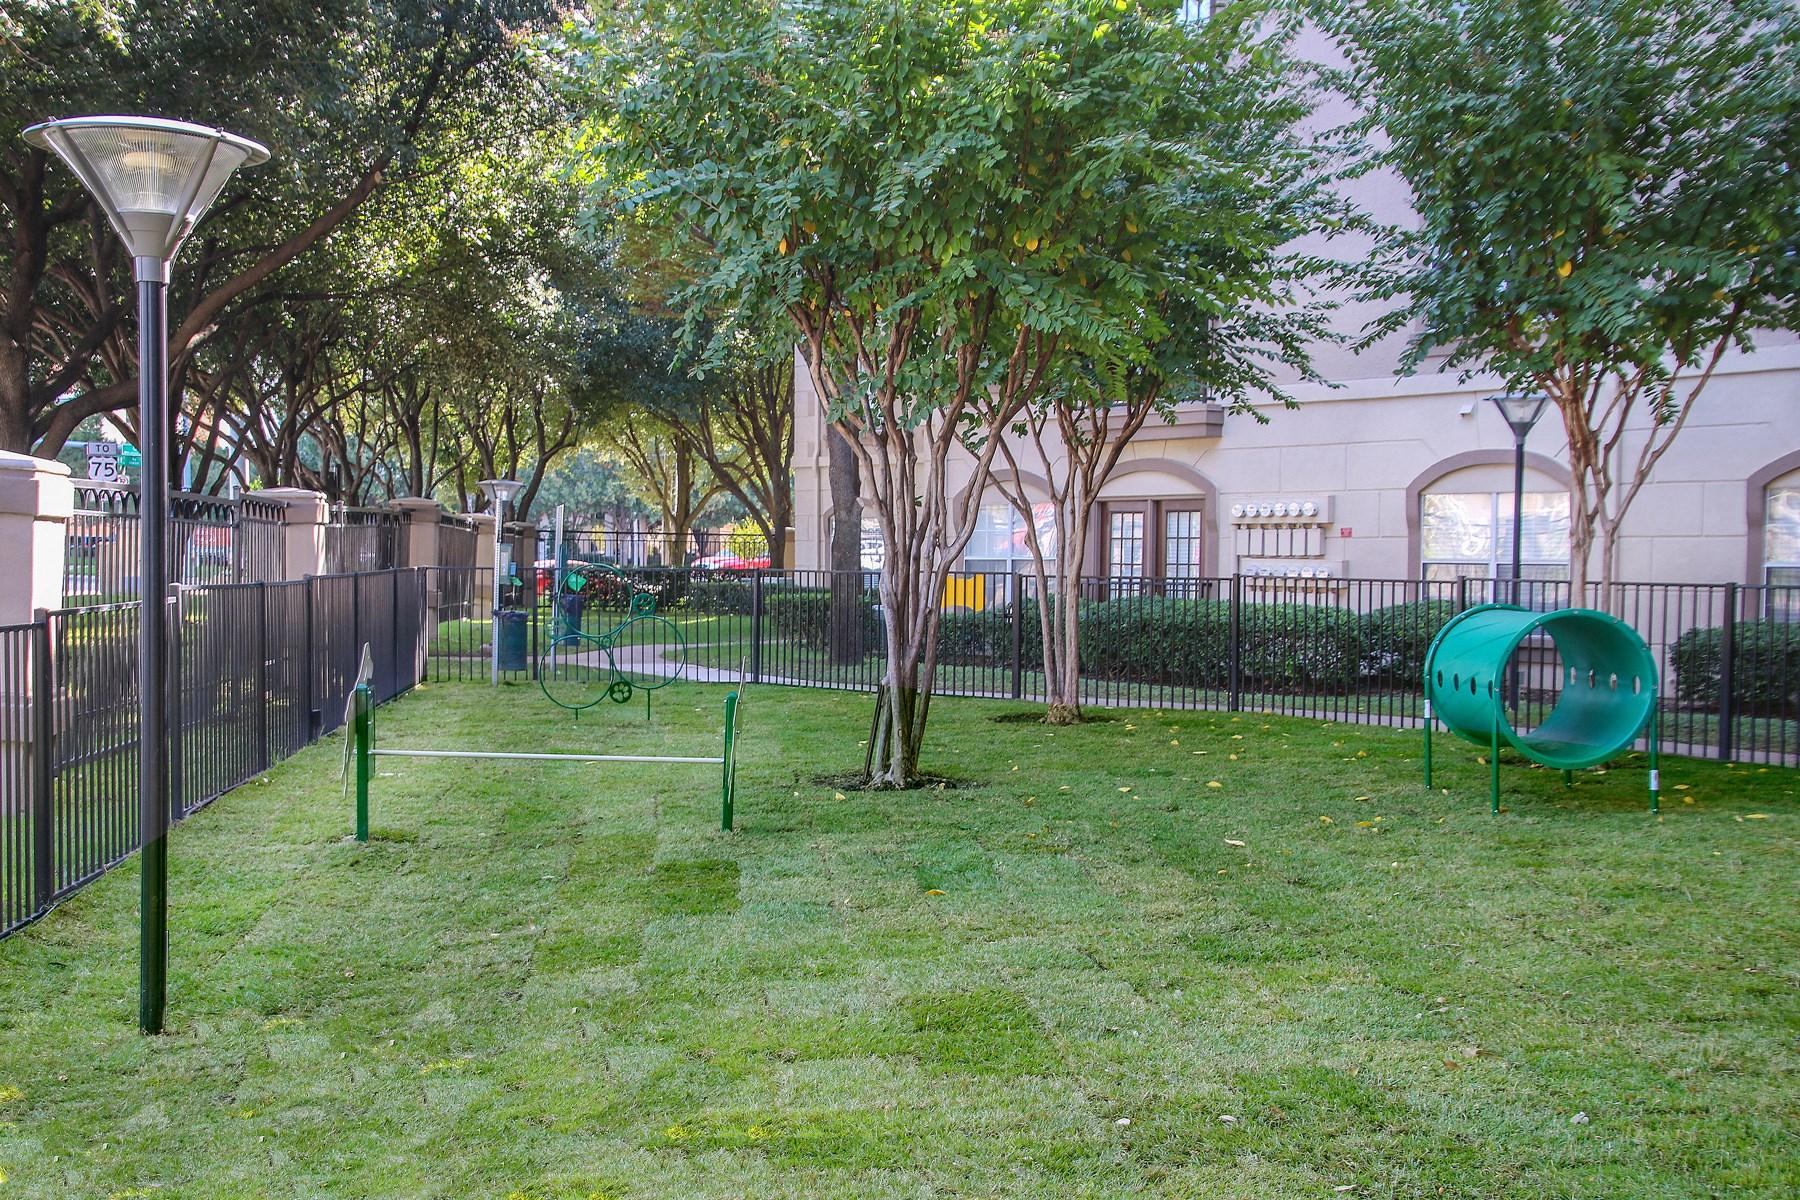 Dog Park at 7900 at Park Central Apartments in Dallas, TX